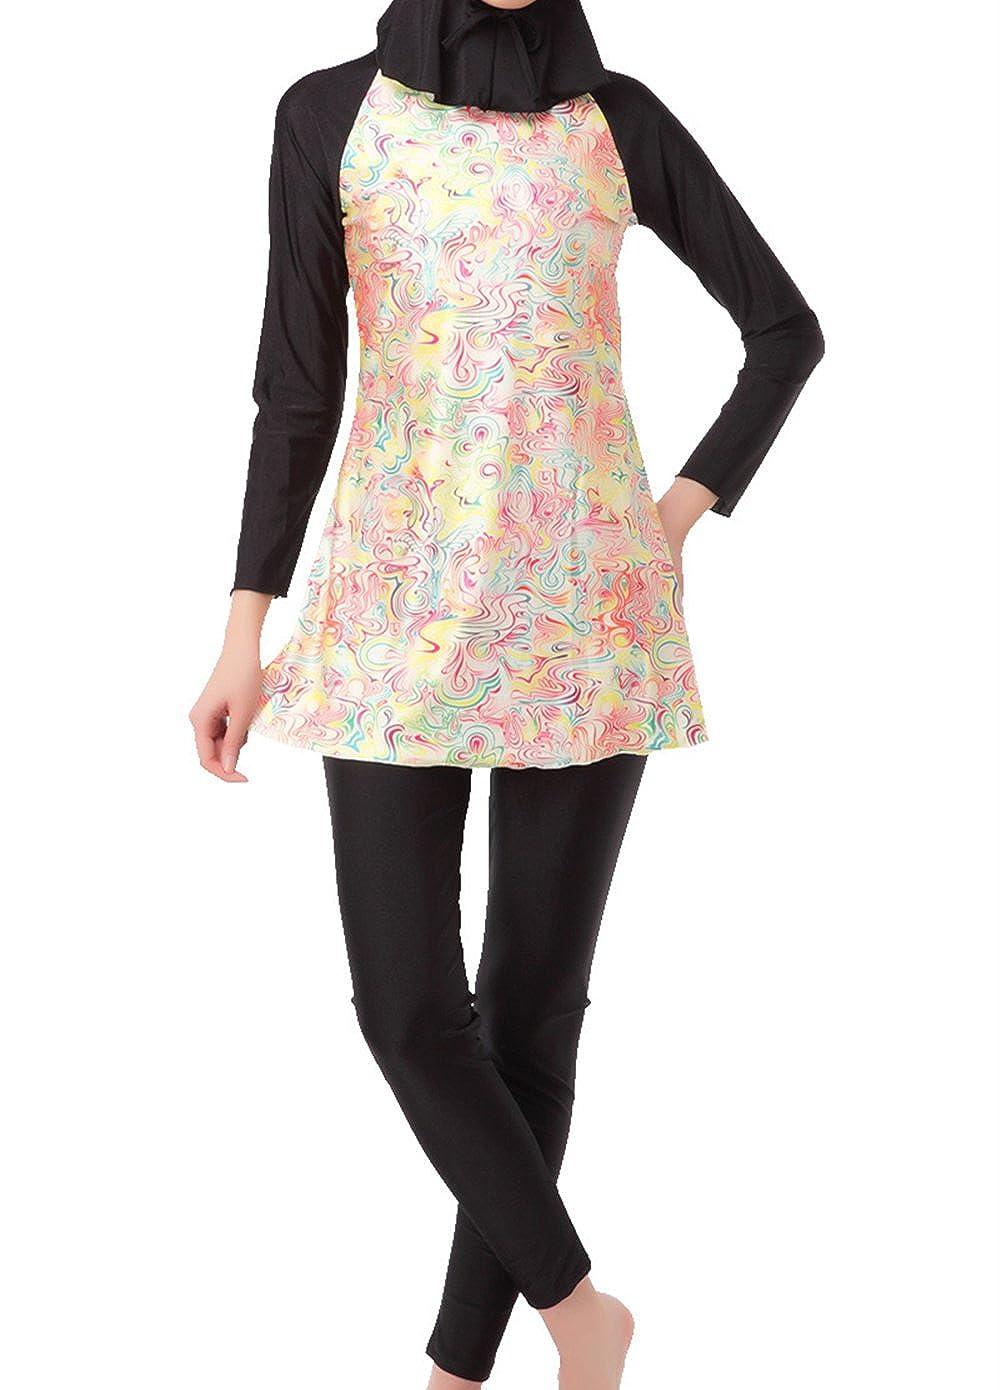 Black zhxinashu Floral Printing Islamic Clothing with Hijab(Three Piece)